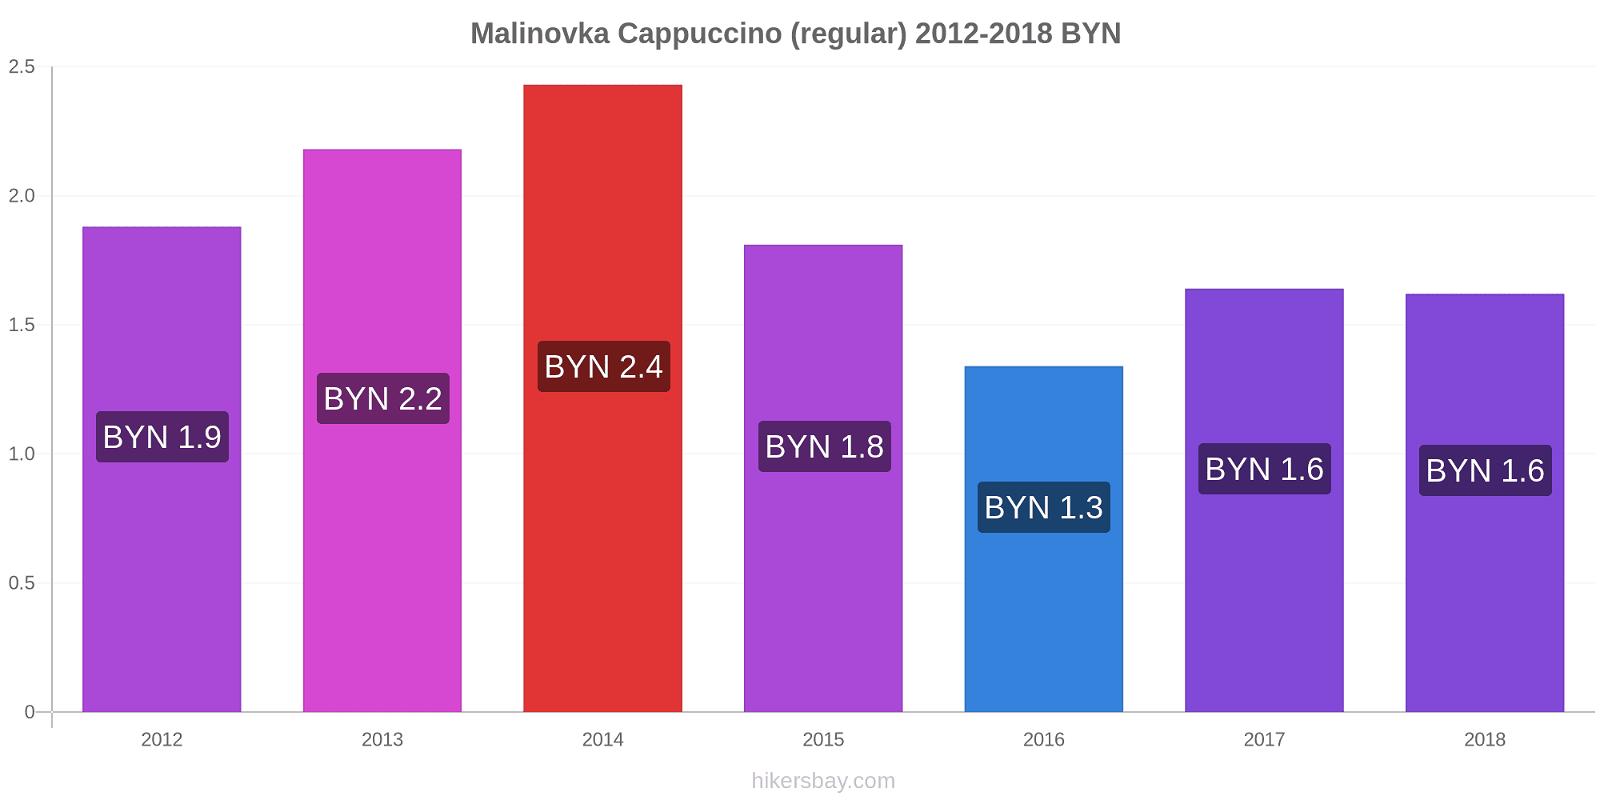 Malinovka price changes Cappuccino (regular) hikersbay.com